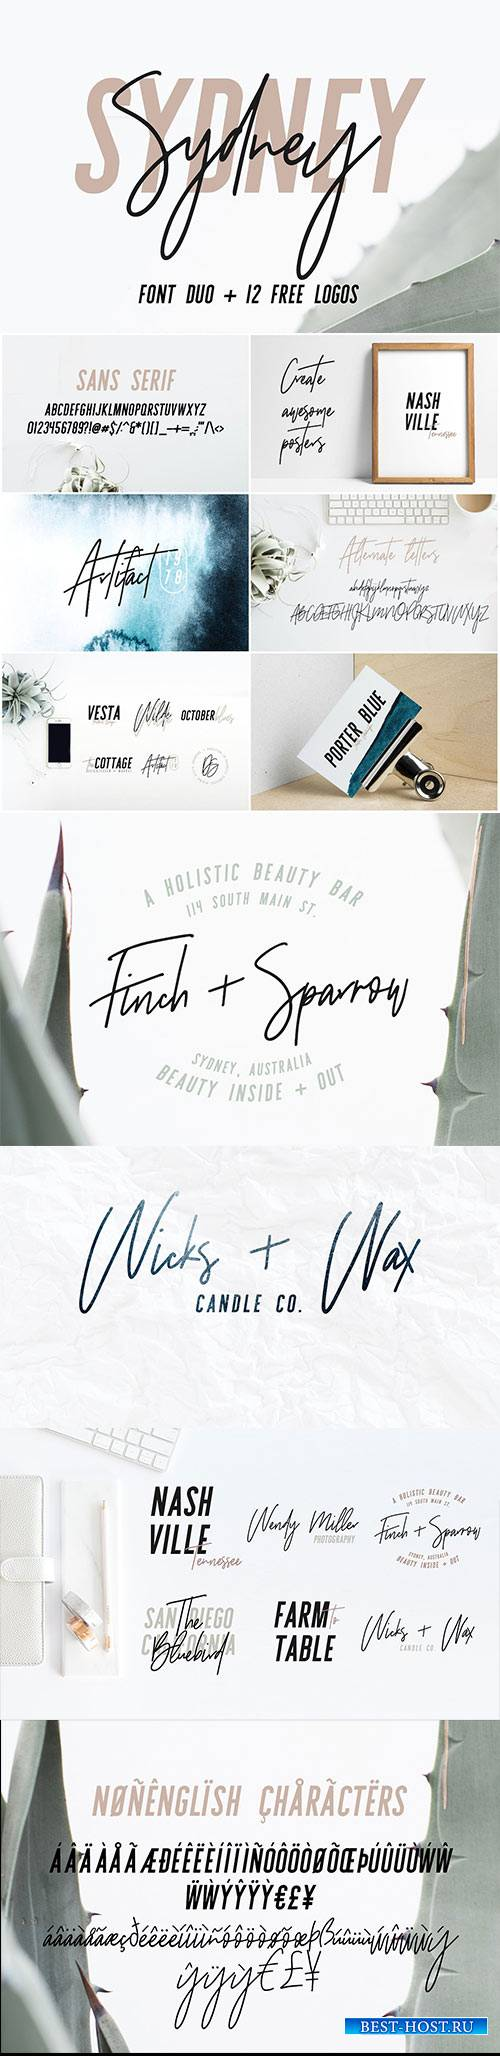 CM - Sydney | Font Duo + 12 Free Logos 1699086